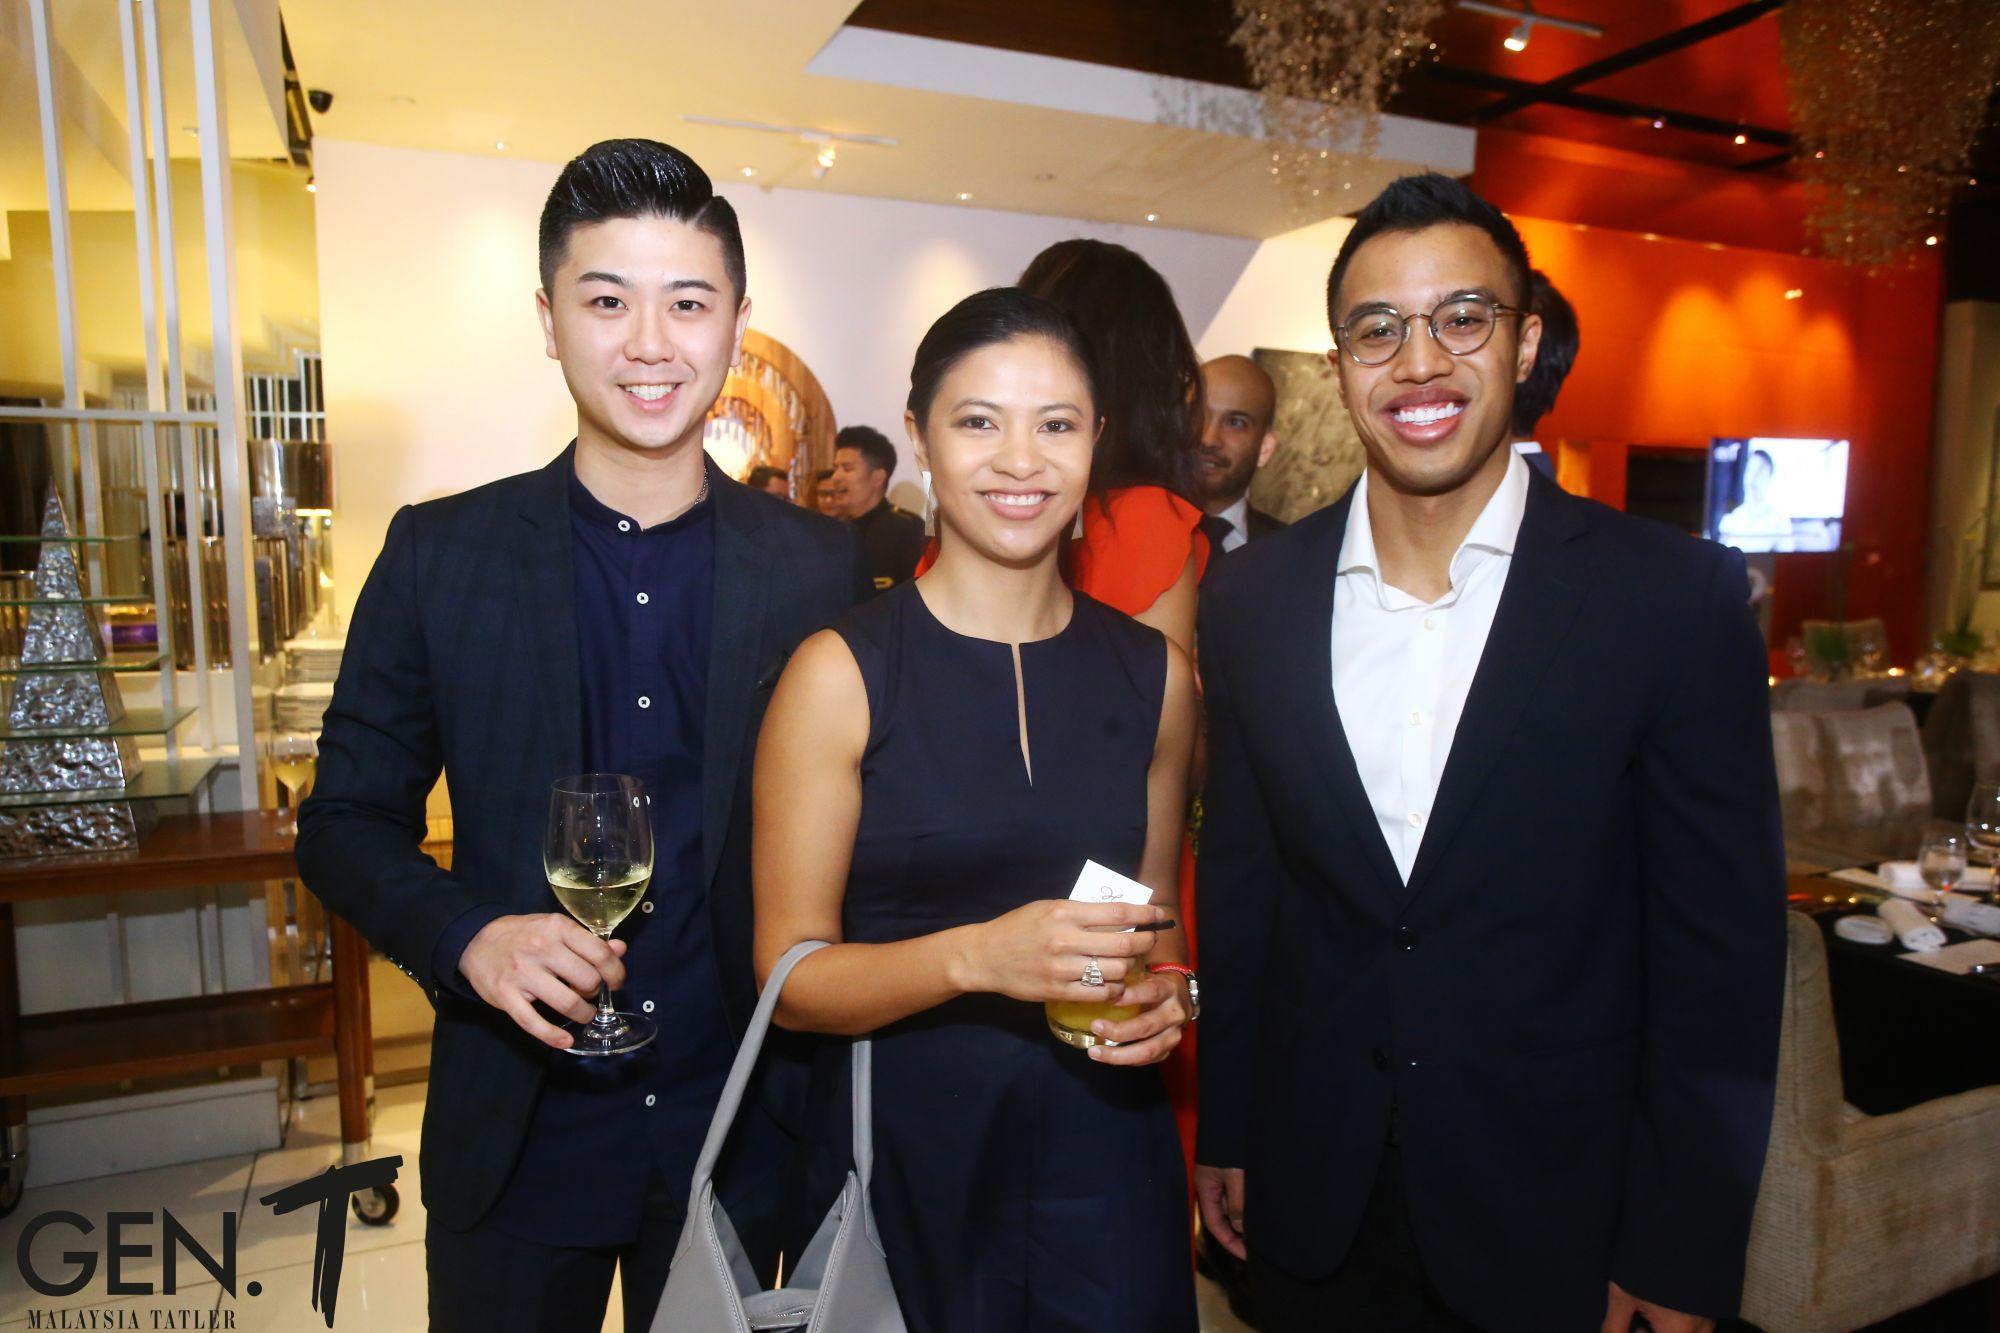 William Sin, Wan Nadiah Wan Mohd Abdullah Yaakob and Faiz Ariffin